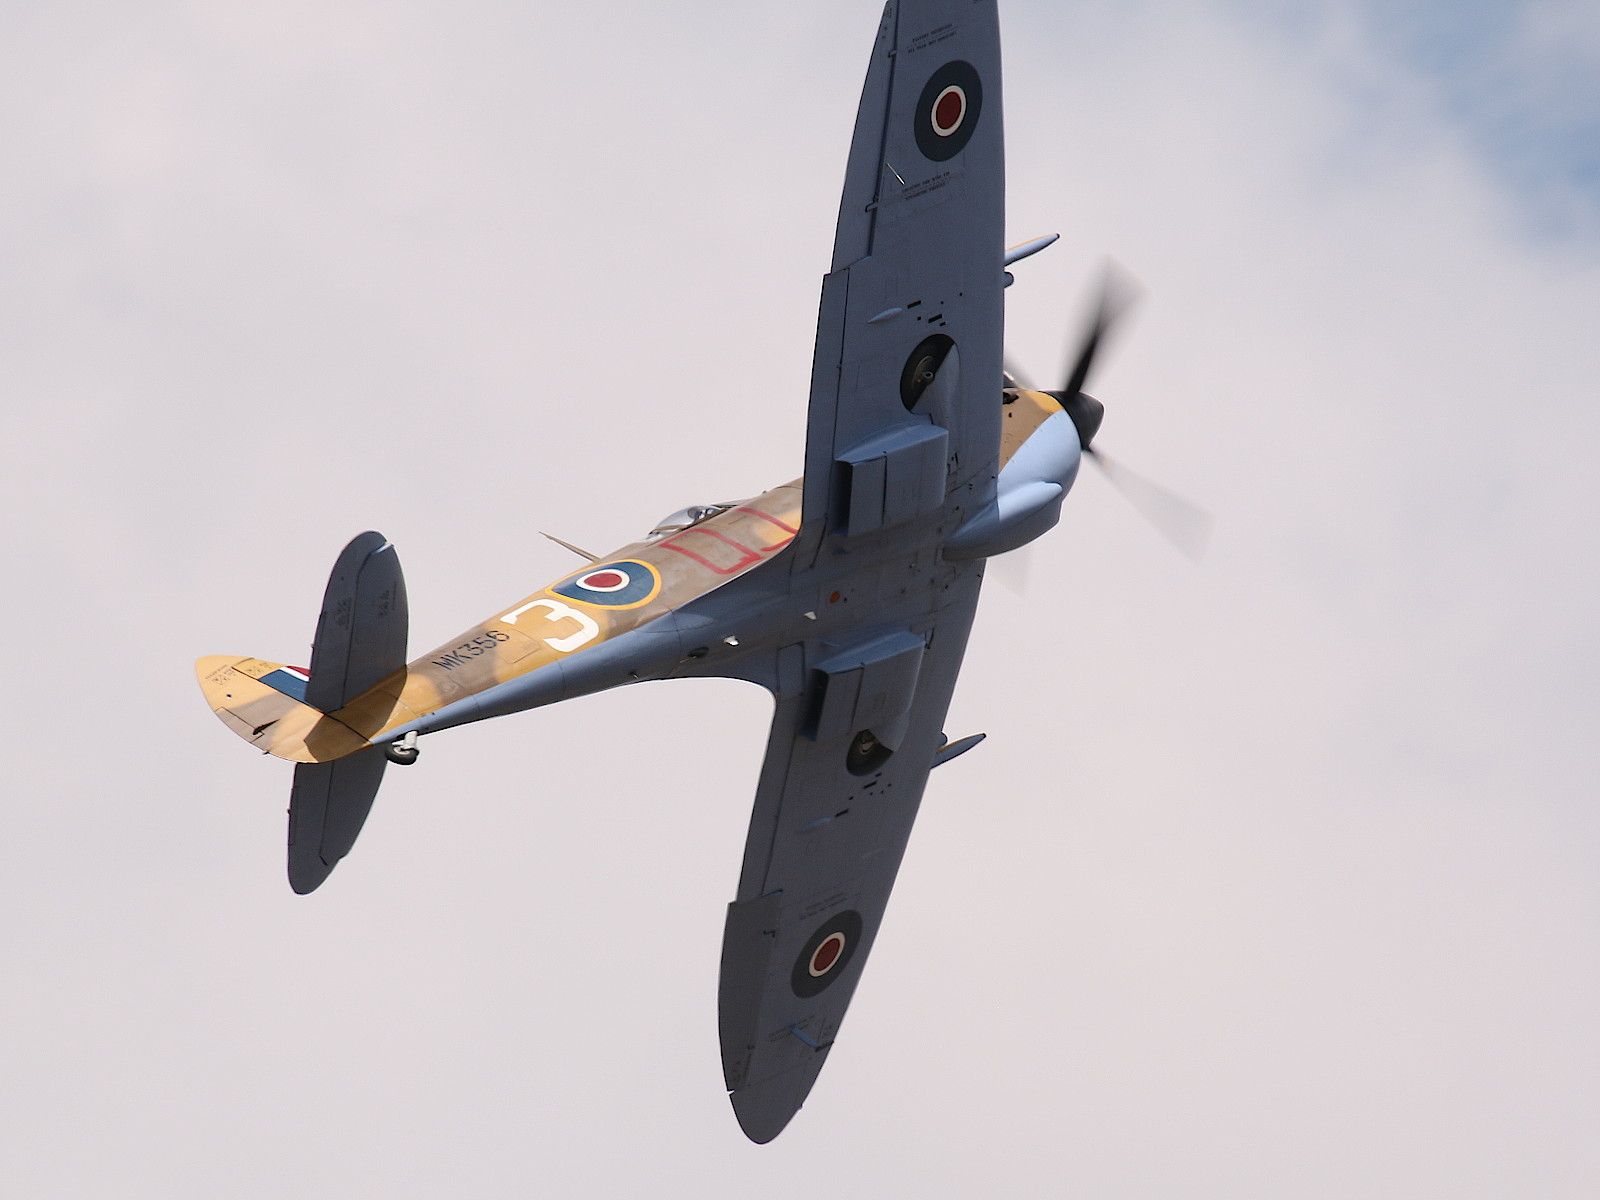 Supermarine Spitfire LF Mk IXc - MK356 © Doppeladler.com